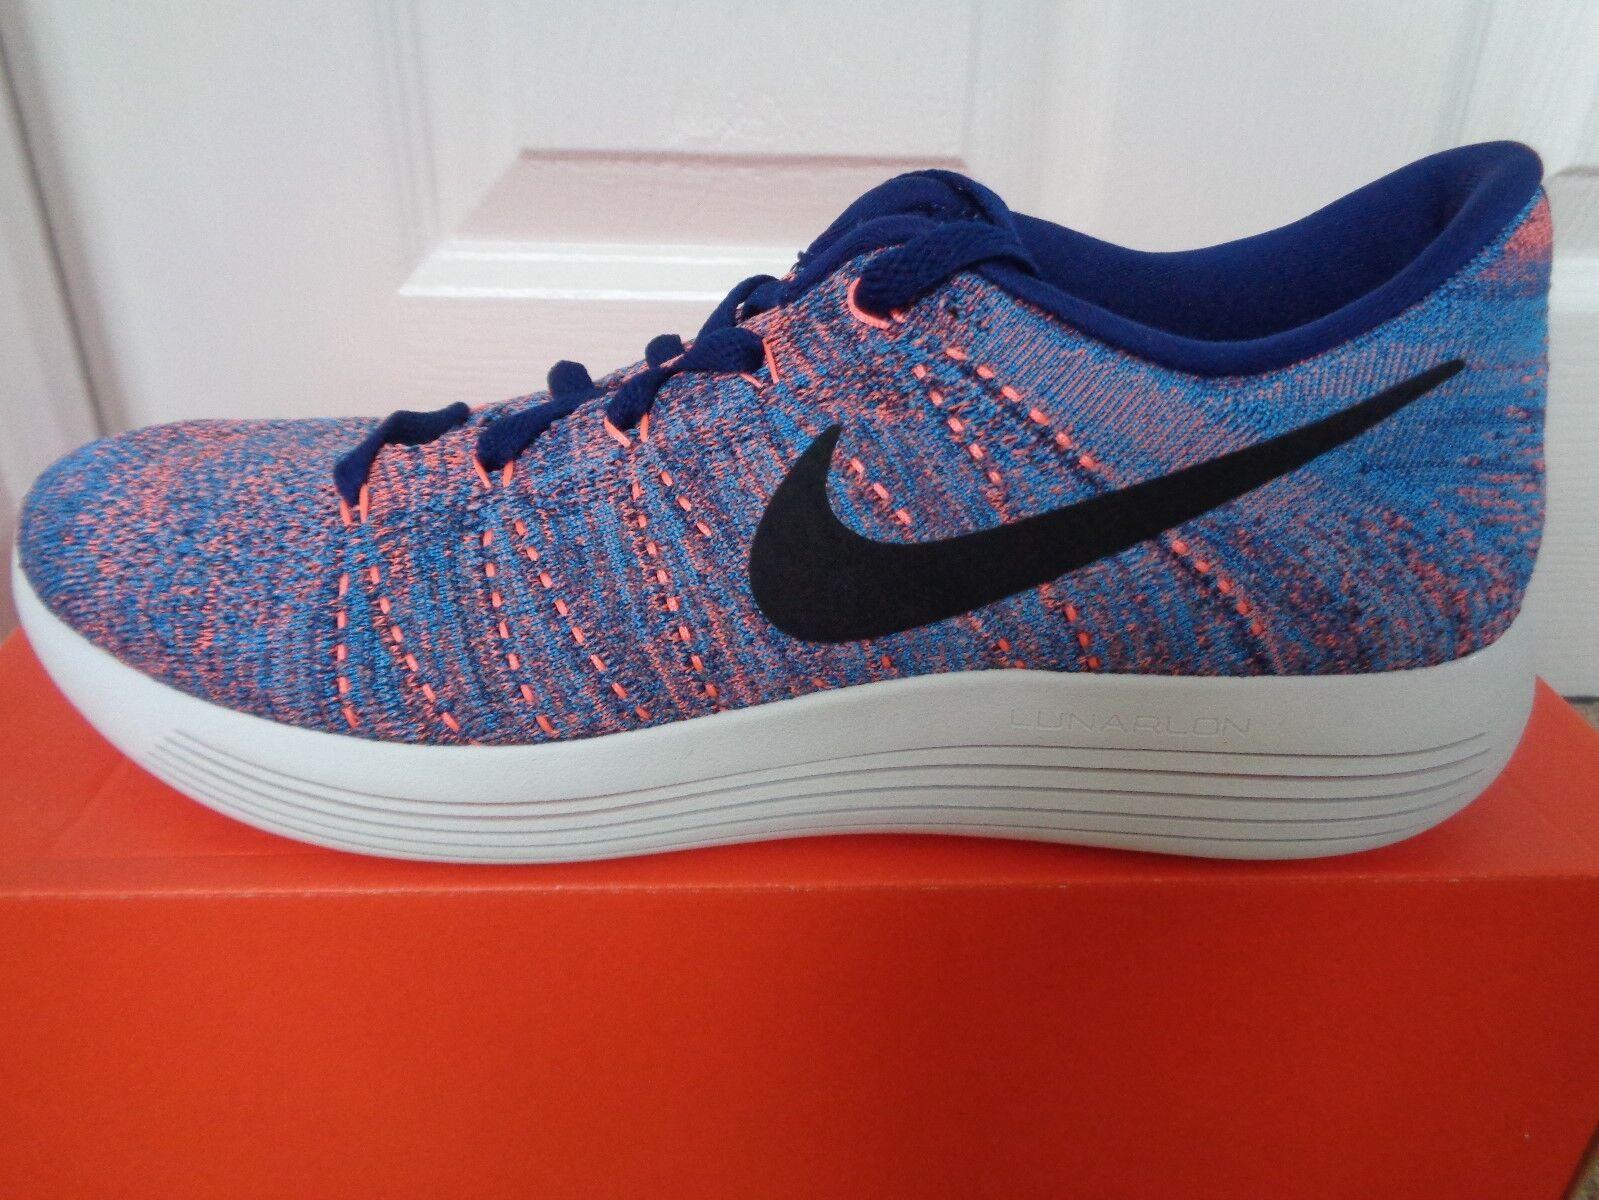 Nike lunarepic Low Flyknit mens trainers eu 42.5 us 9 NEW+BOX